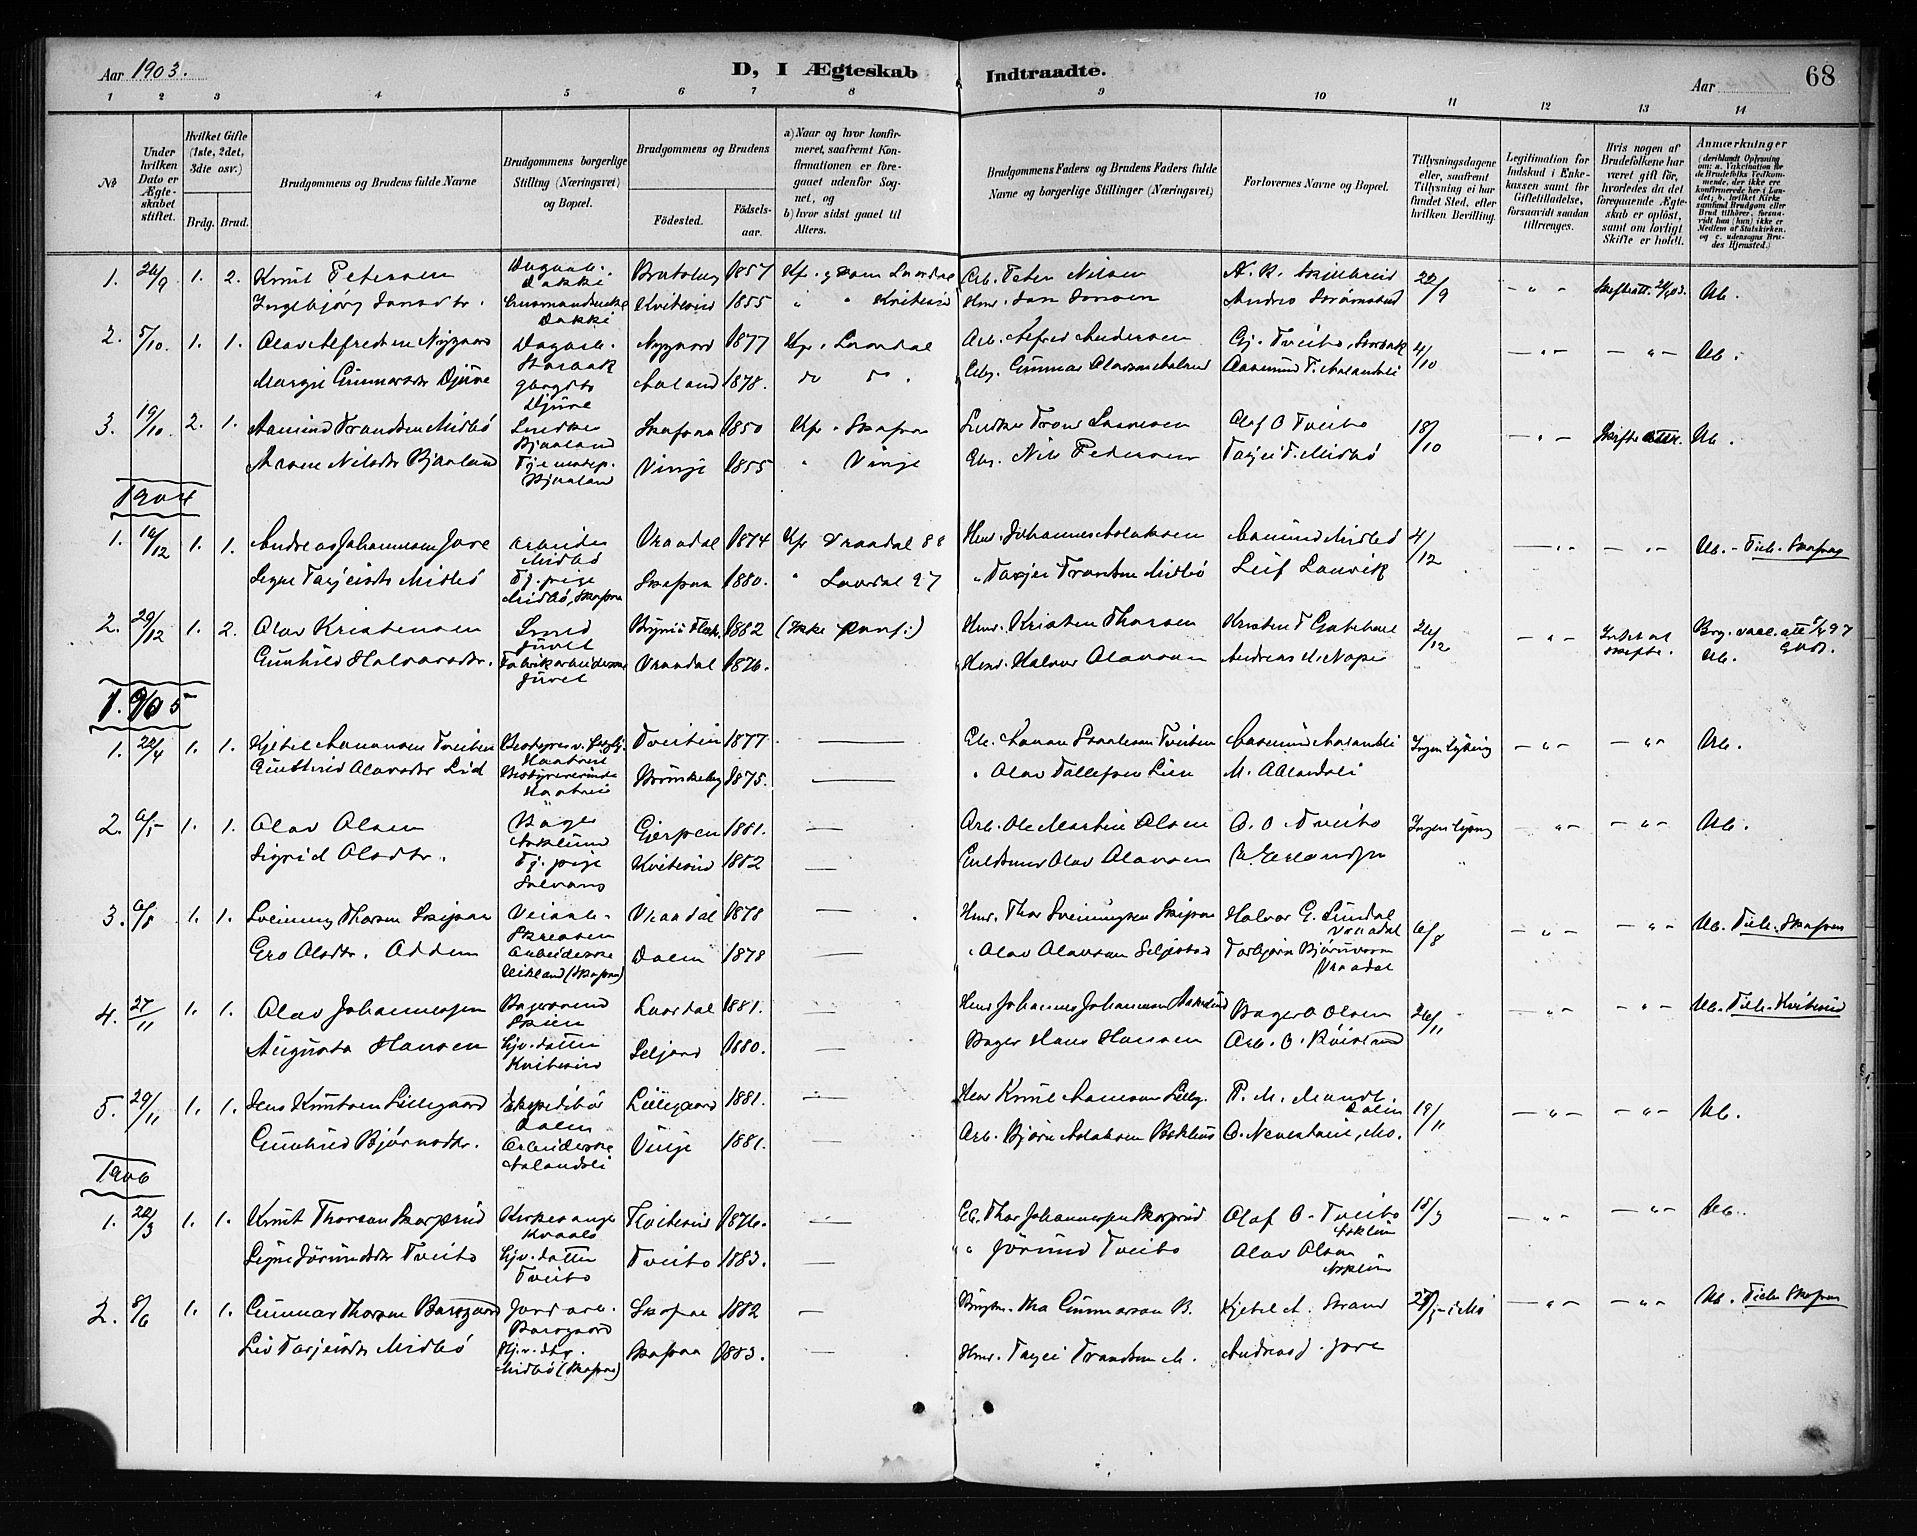 SAKO, Lårdal kirkebøker, G/Ga/L0003: Klokkerbok nr. I 3, 1891-1918, s. 68